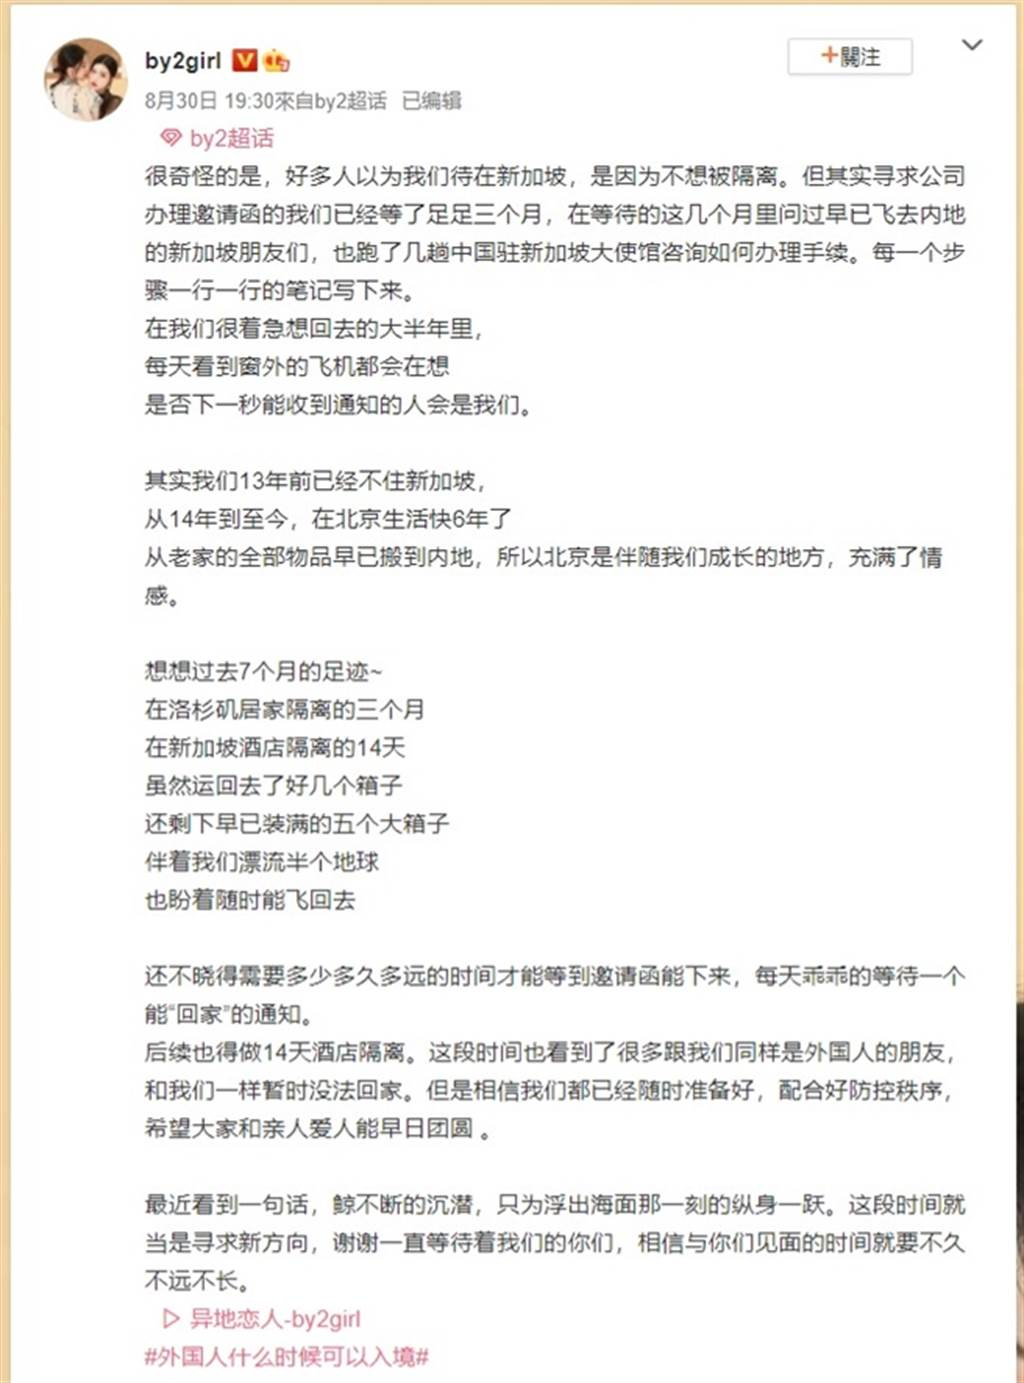 By2發文求救想回大陸。(圖/翻攝自by2girl微博)